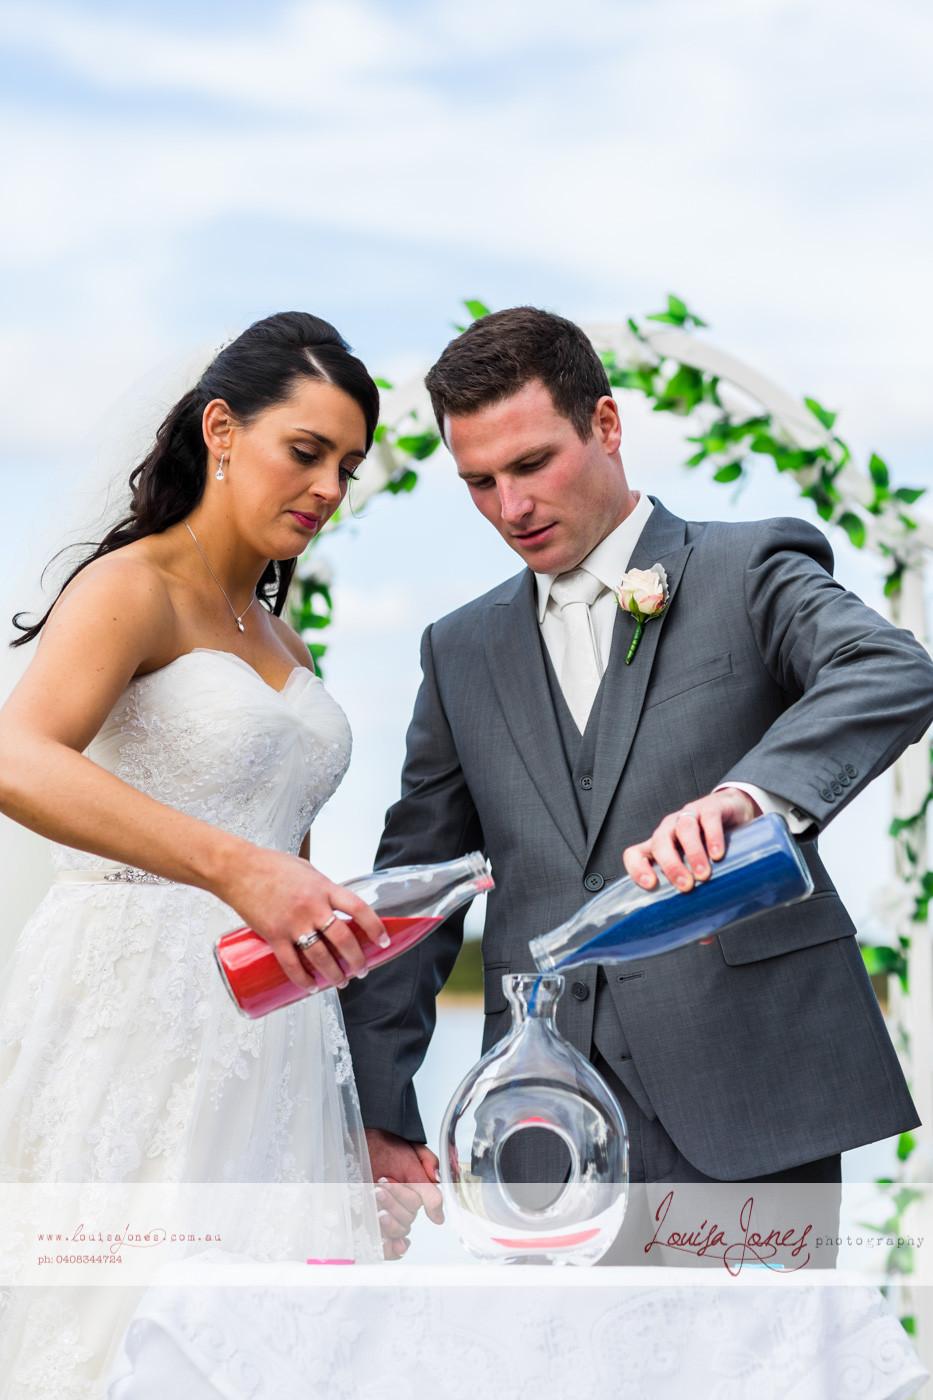 Geelong Surf Coast Wedding Photographer 067.jpg